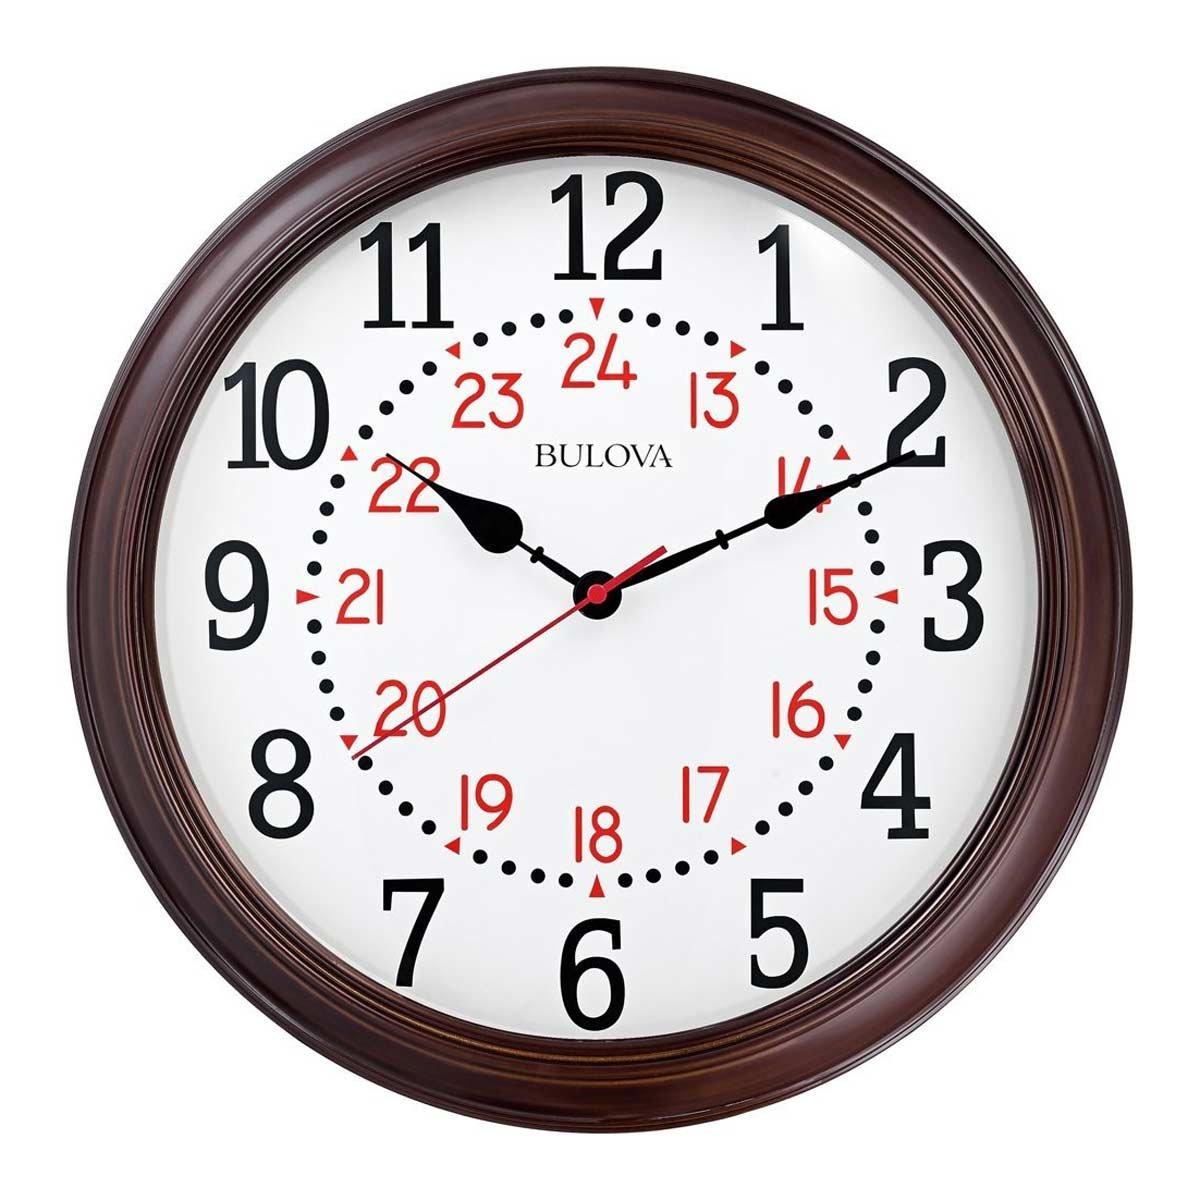 Bulova C4841 Station Master Wall Clock, Espresso Finish